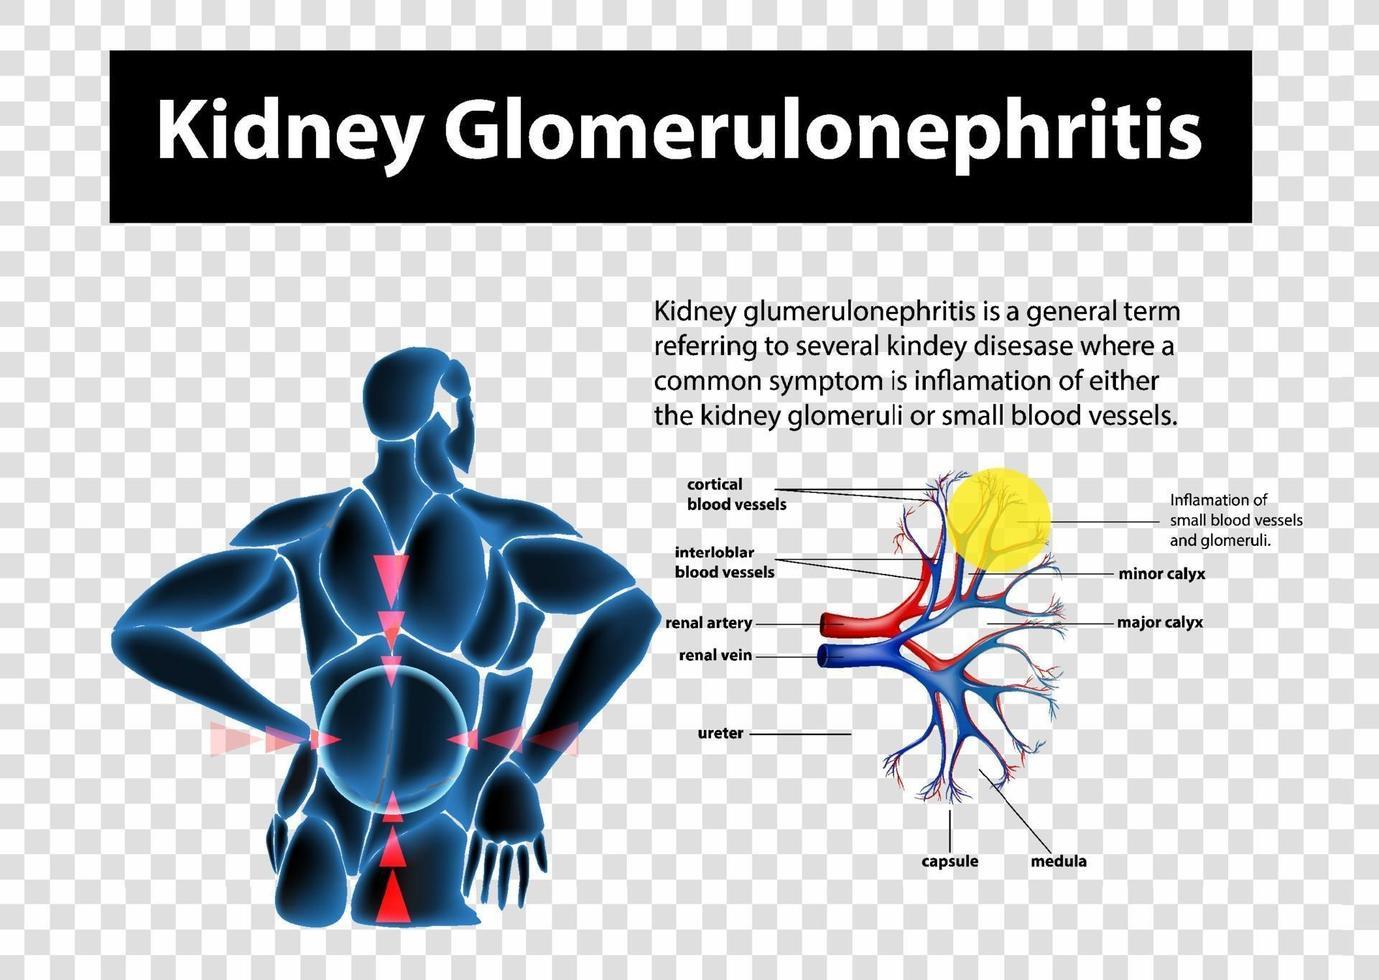 diagram som visar njure glomerulonephritis på transparent bakgrund vektor